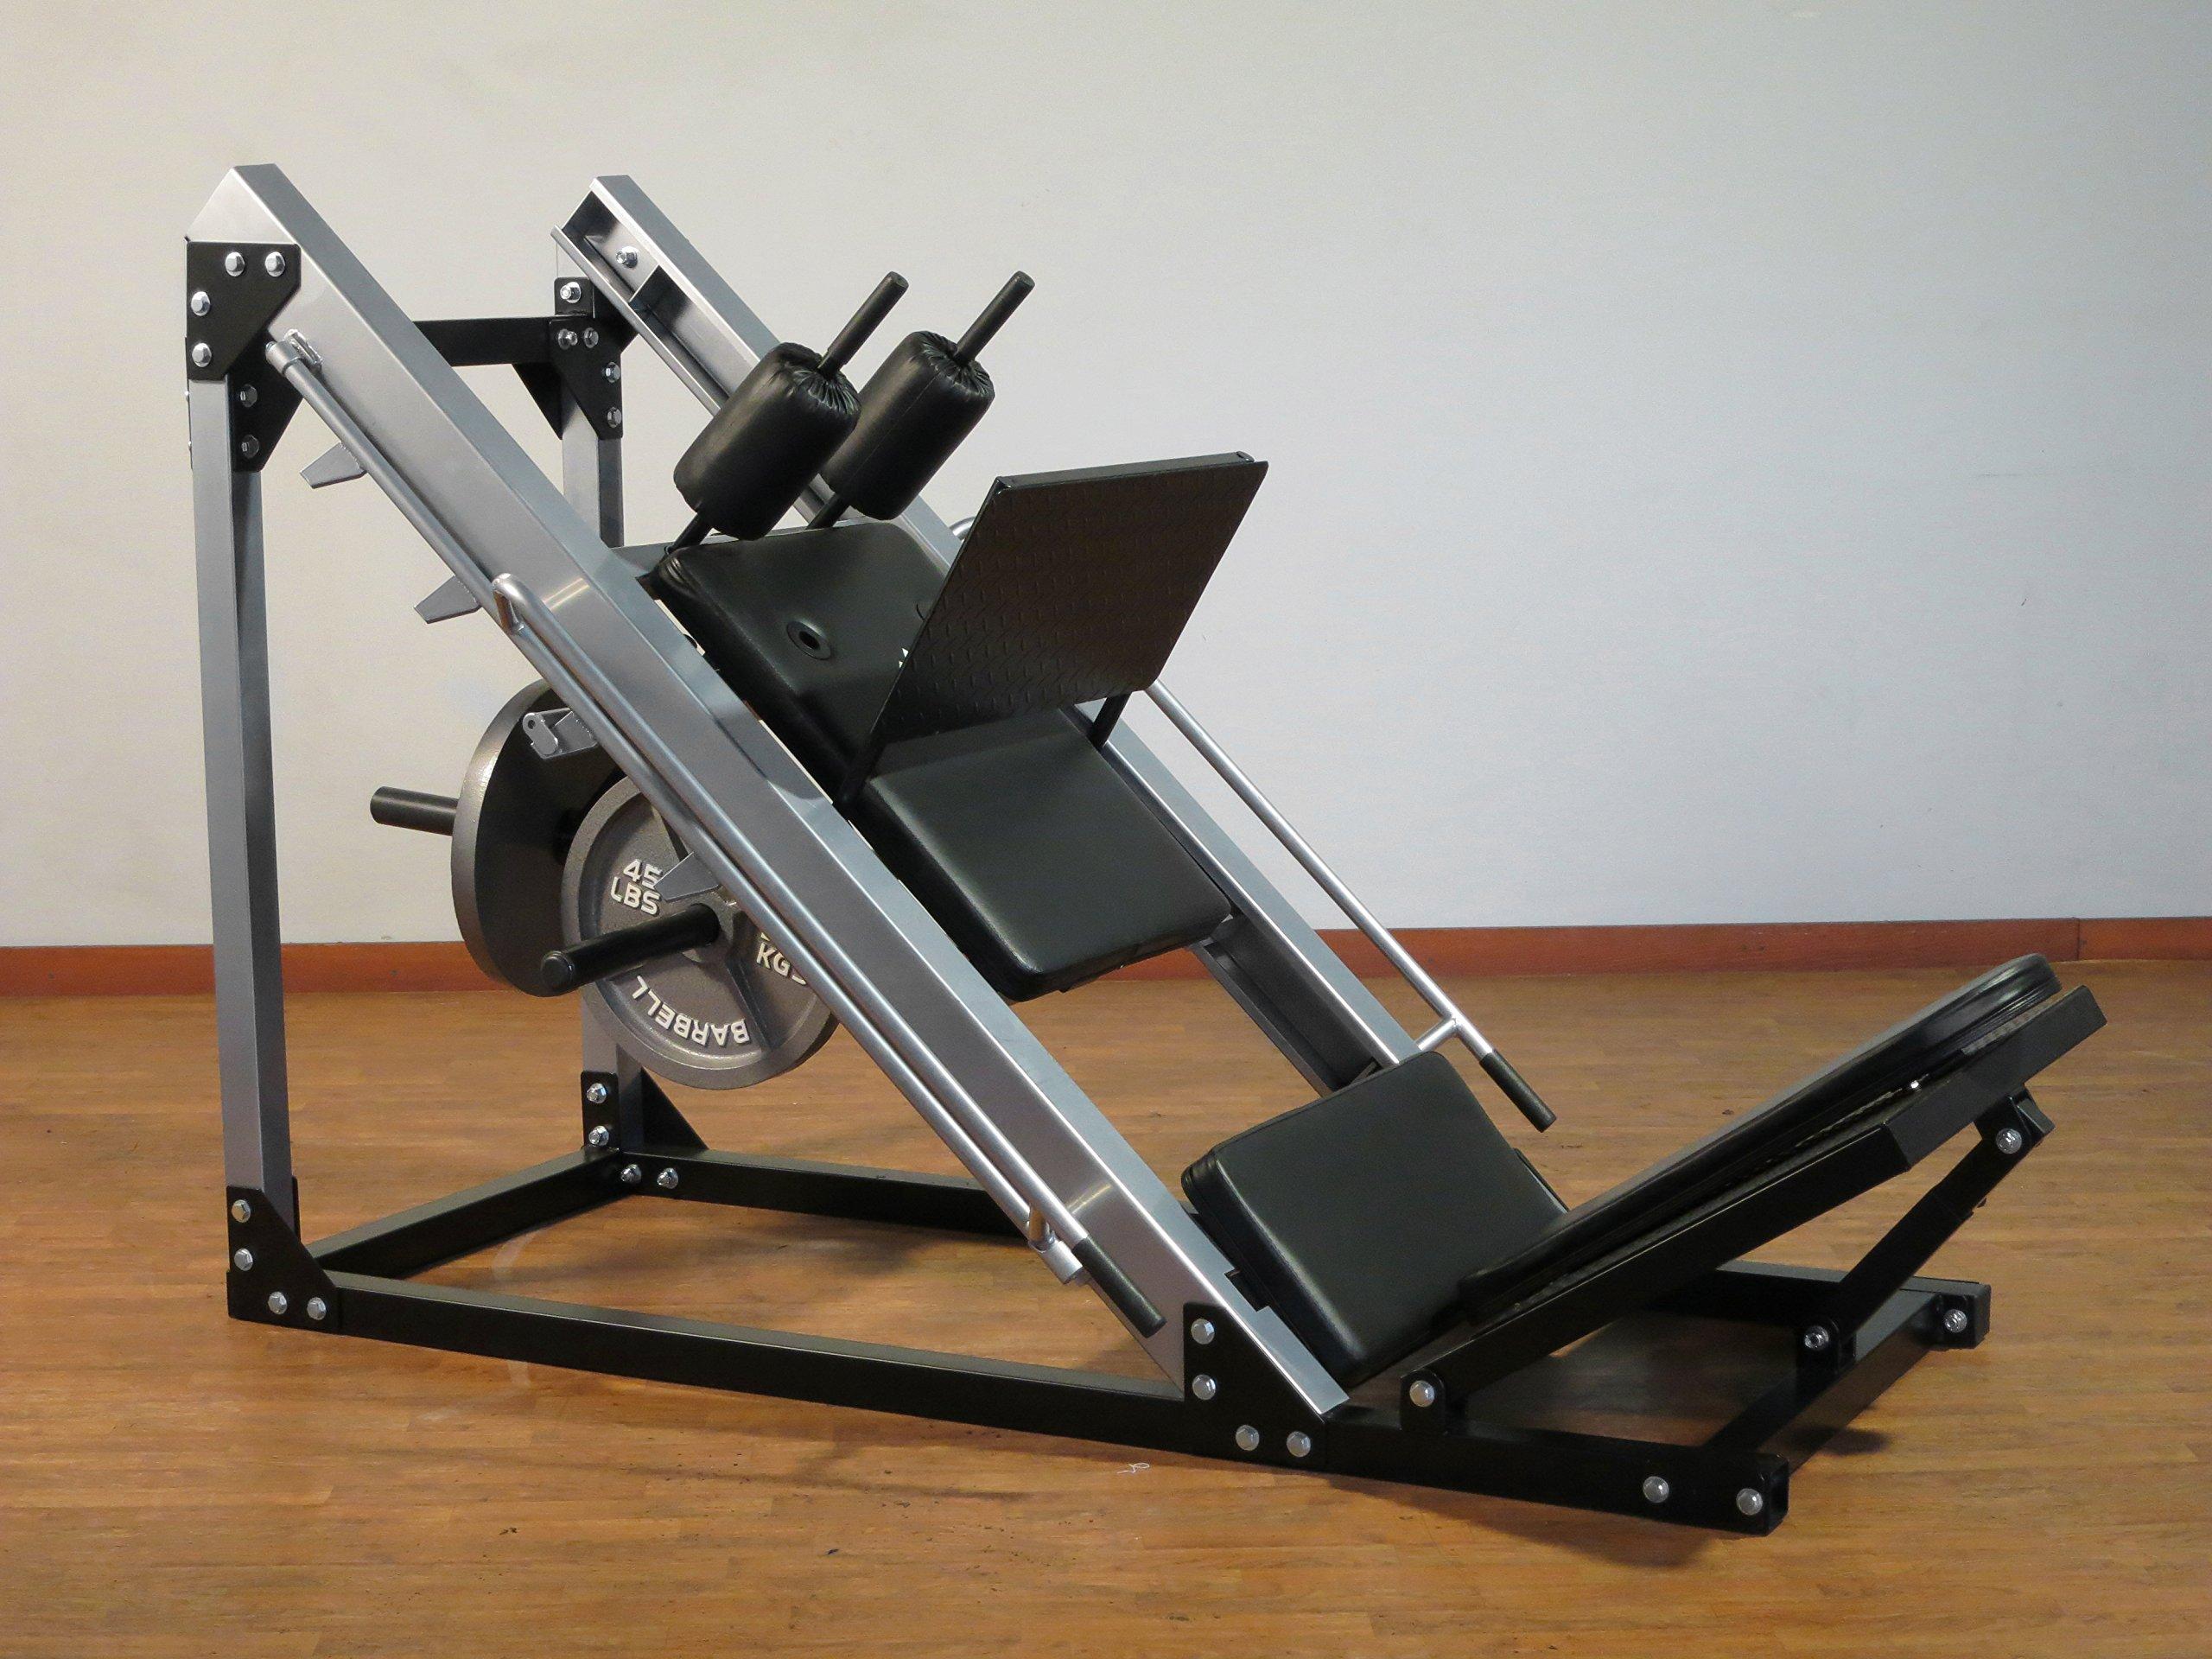 Model HLS2000 Hack Squat/Leg Press by Yukon Fitness